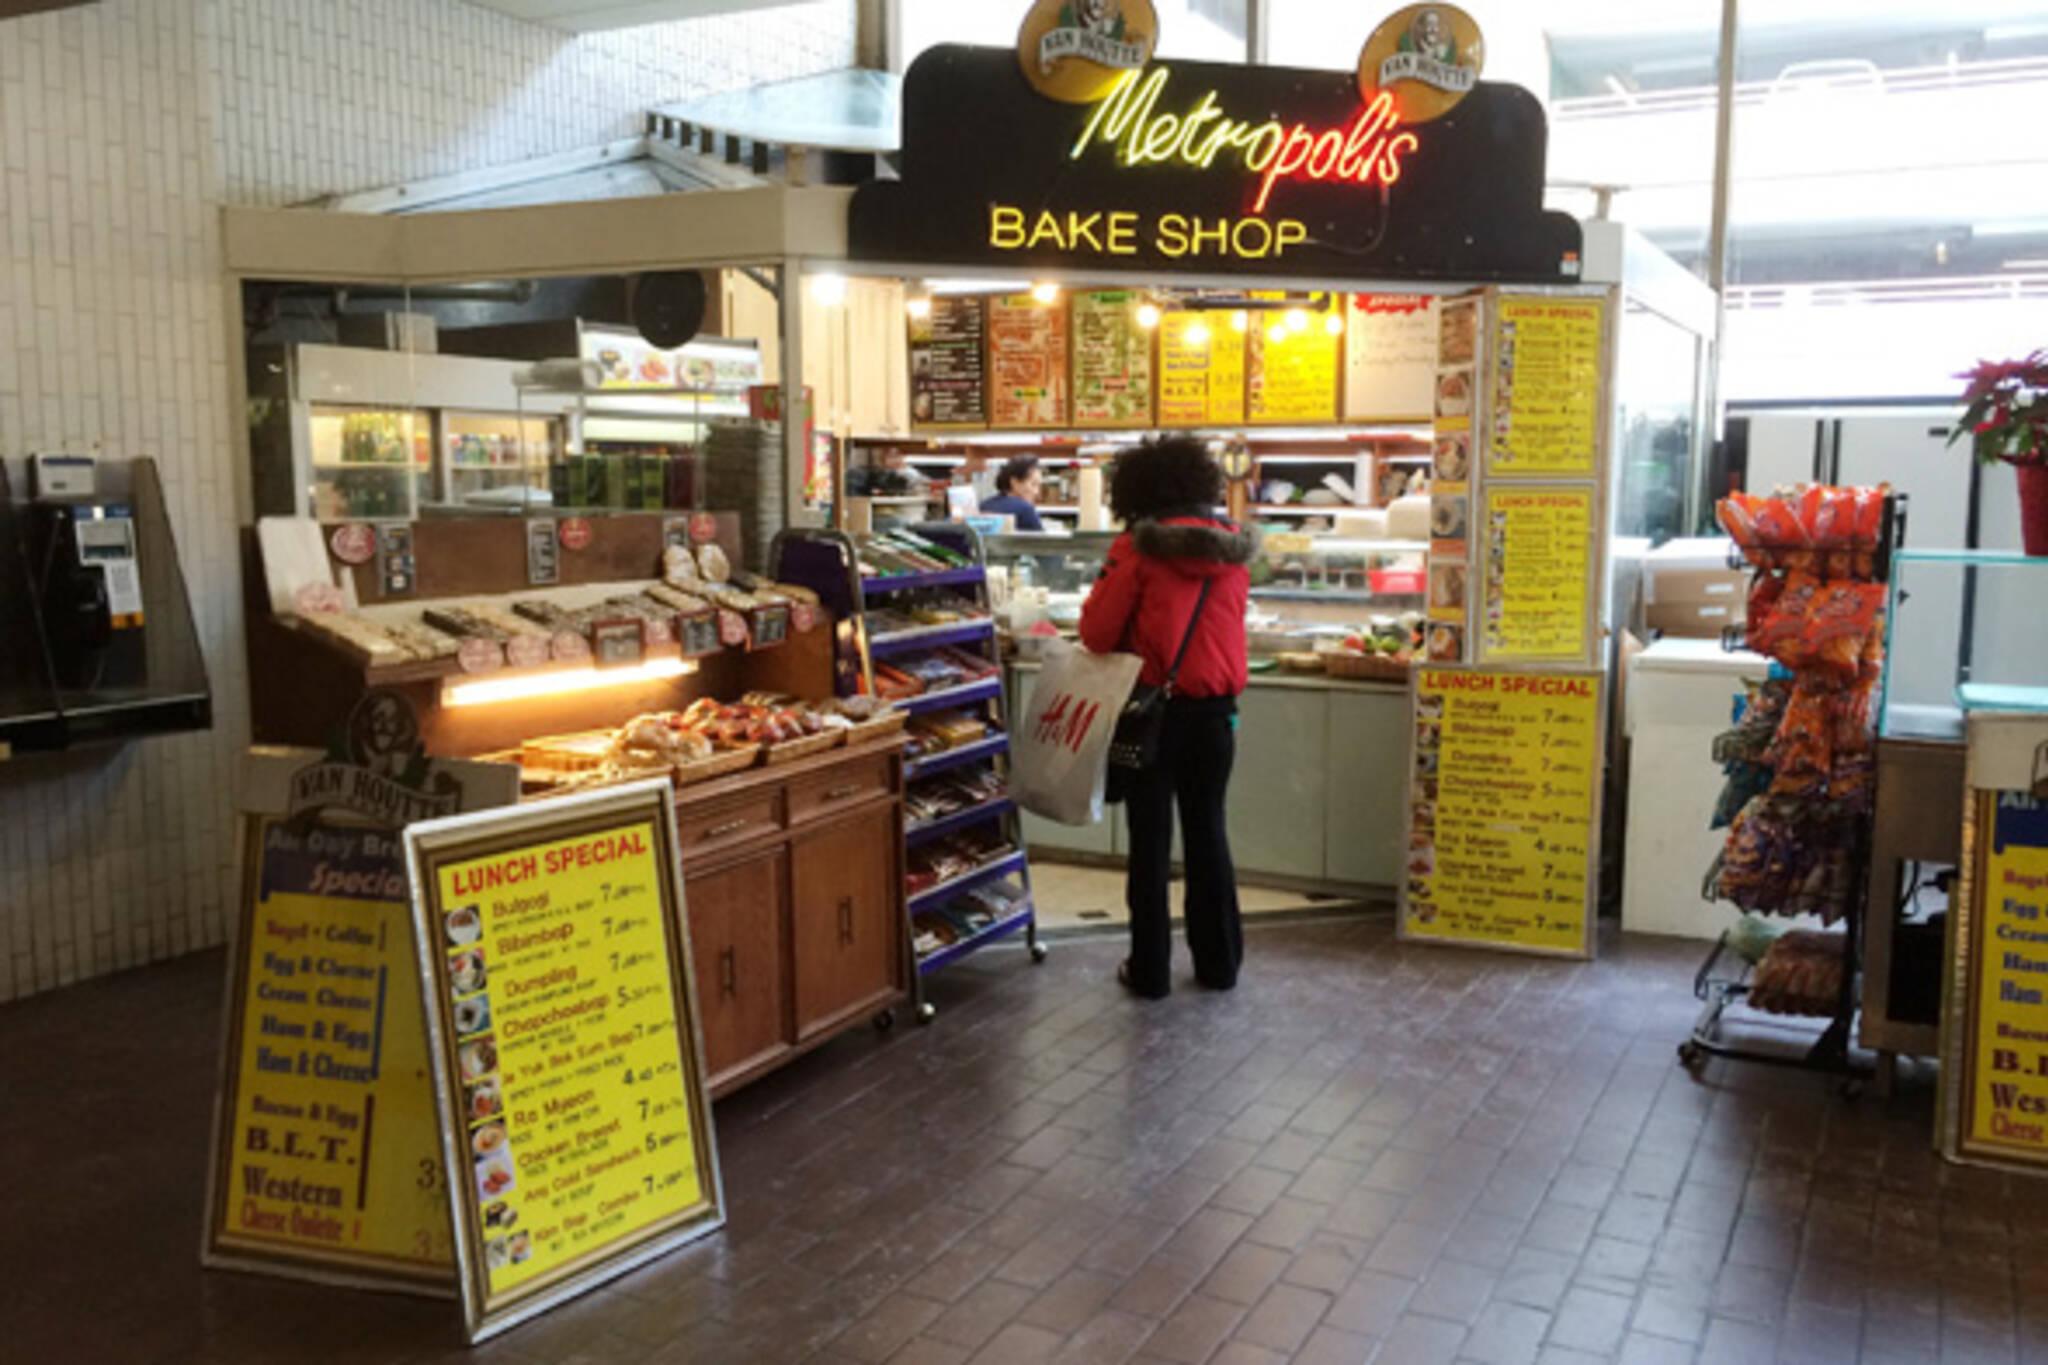 Metropolis Bake Shop